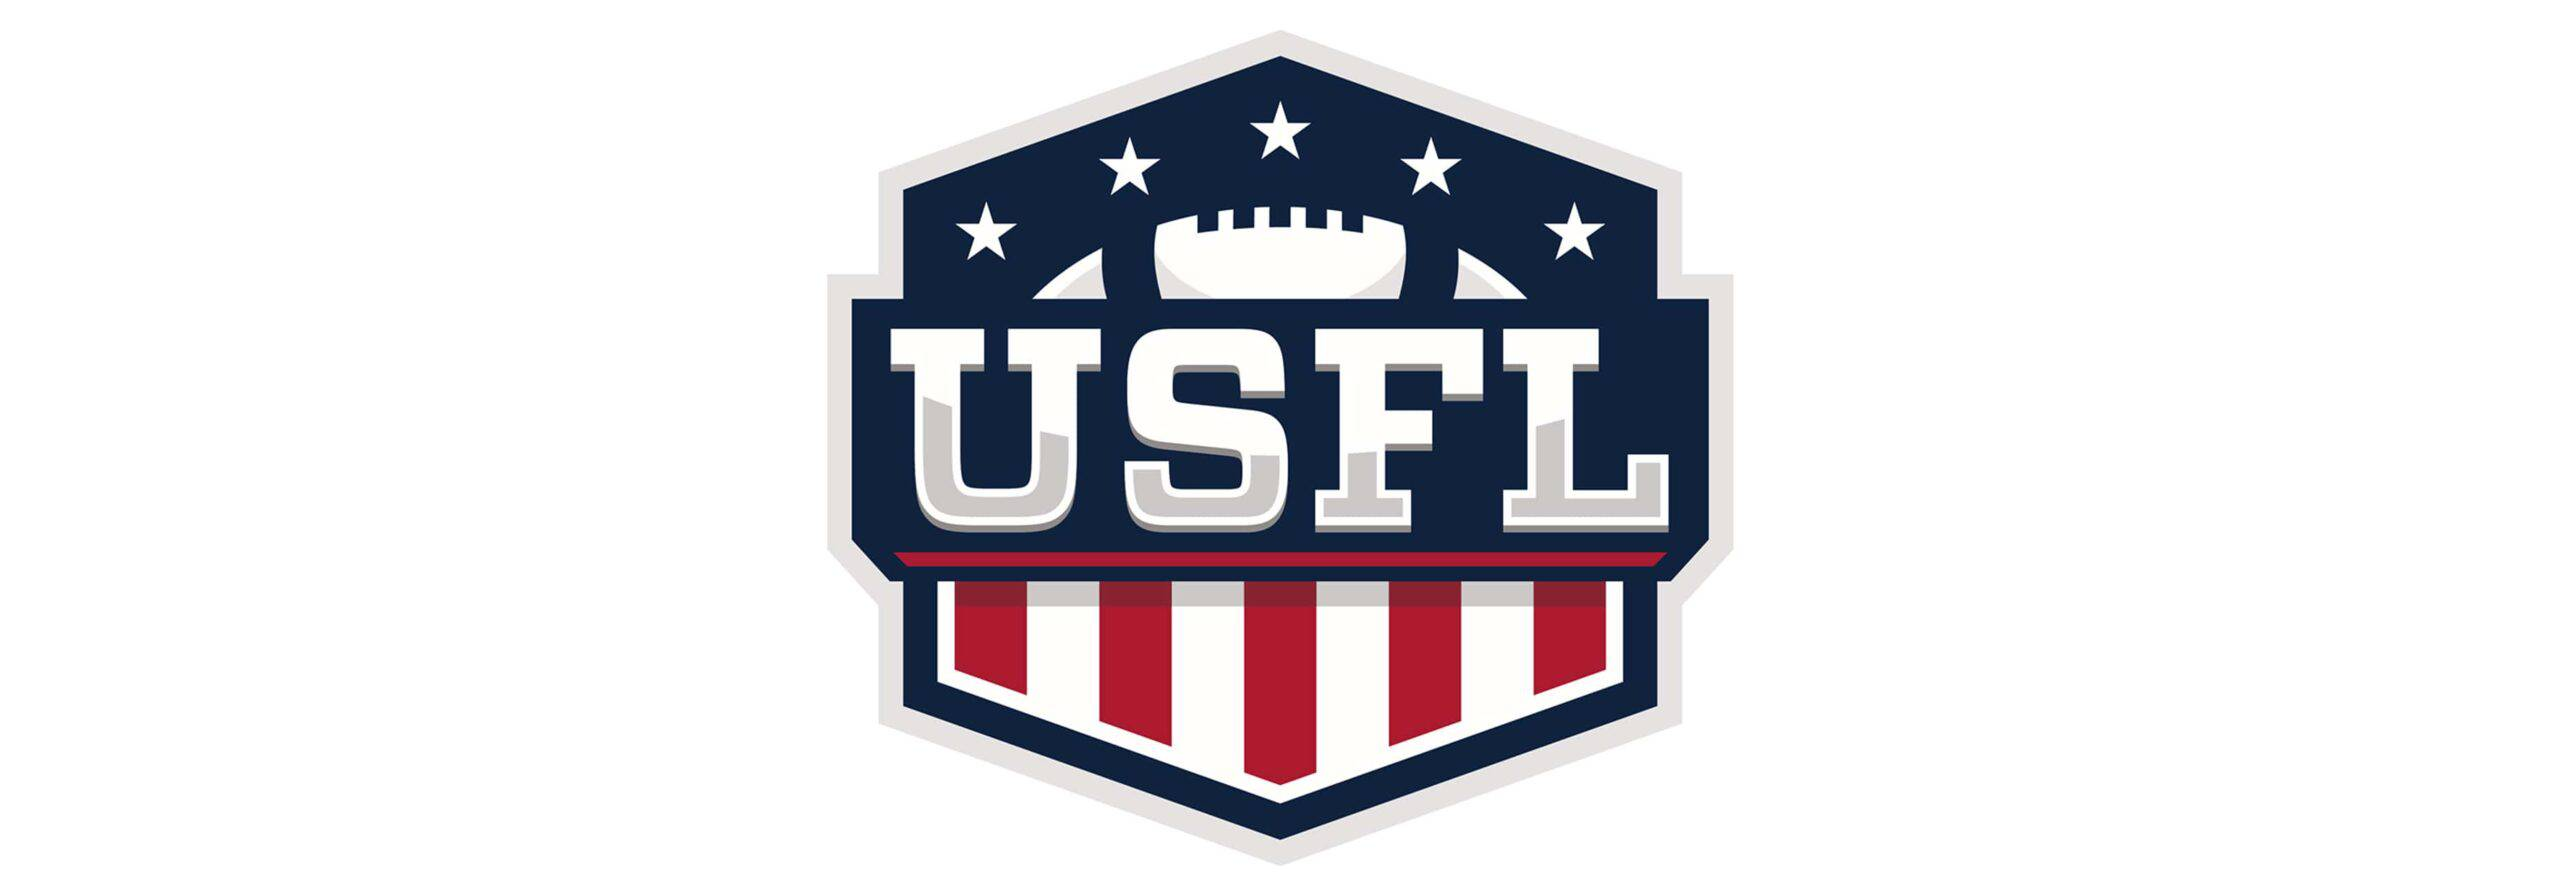 US Football League